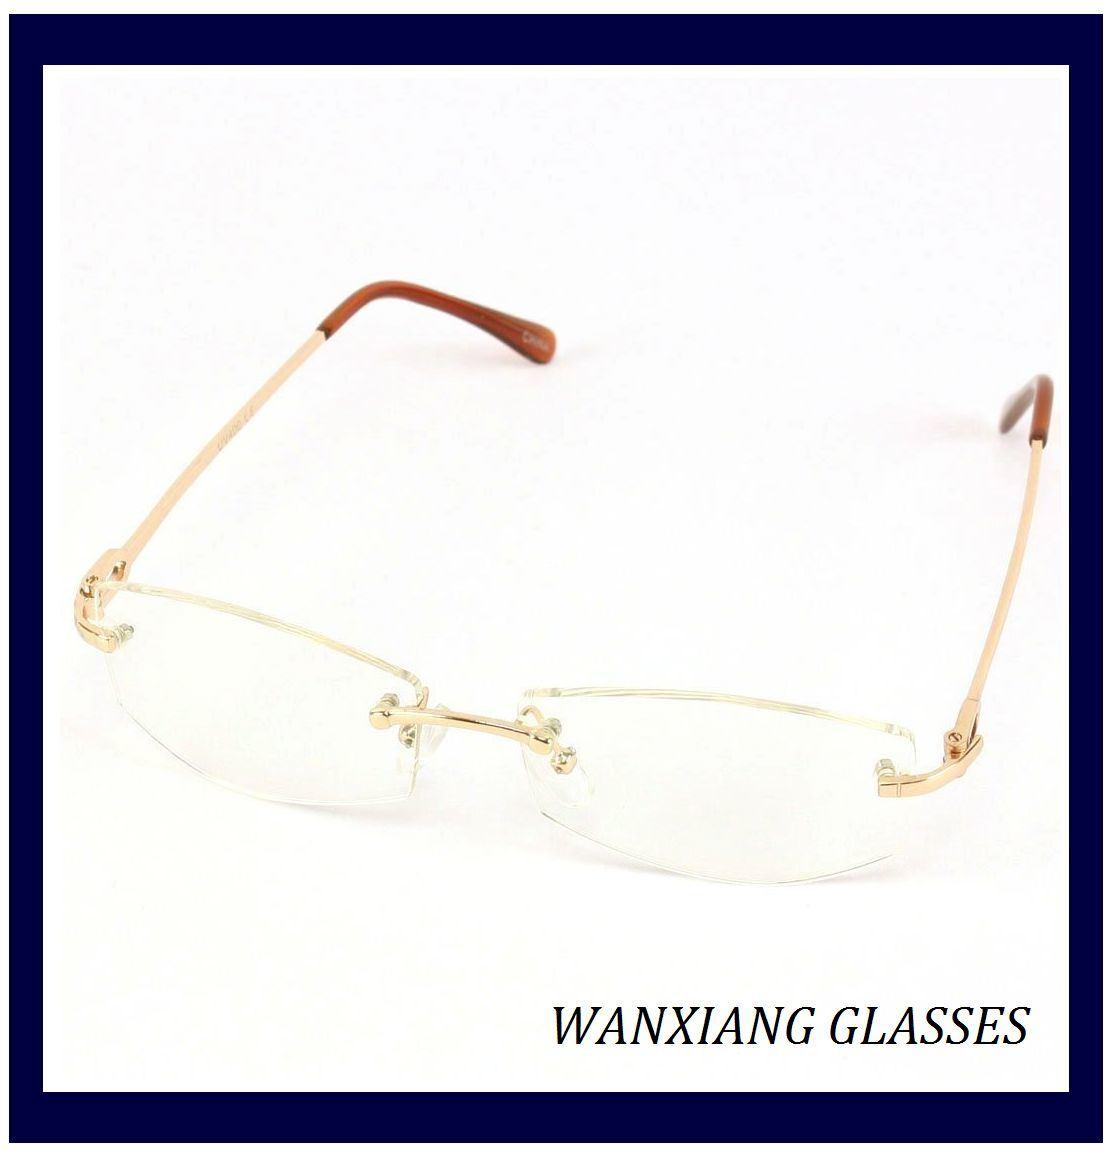 Glasses Frames - Imtopro International Company - page 1.